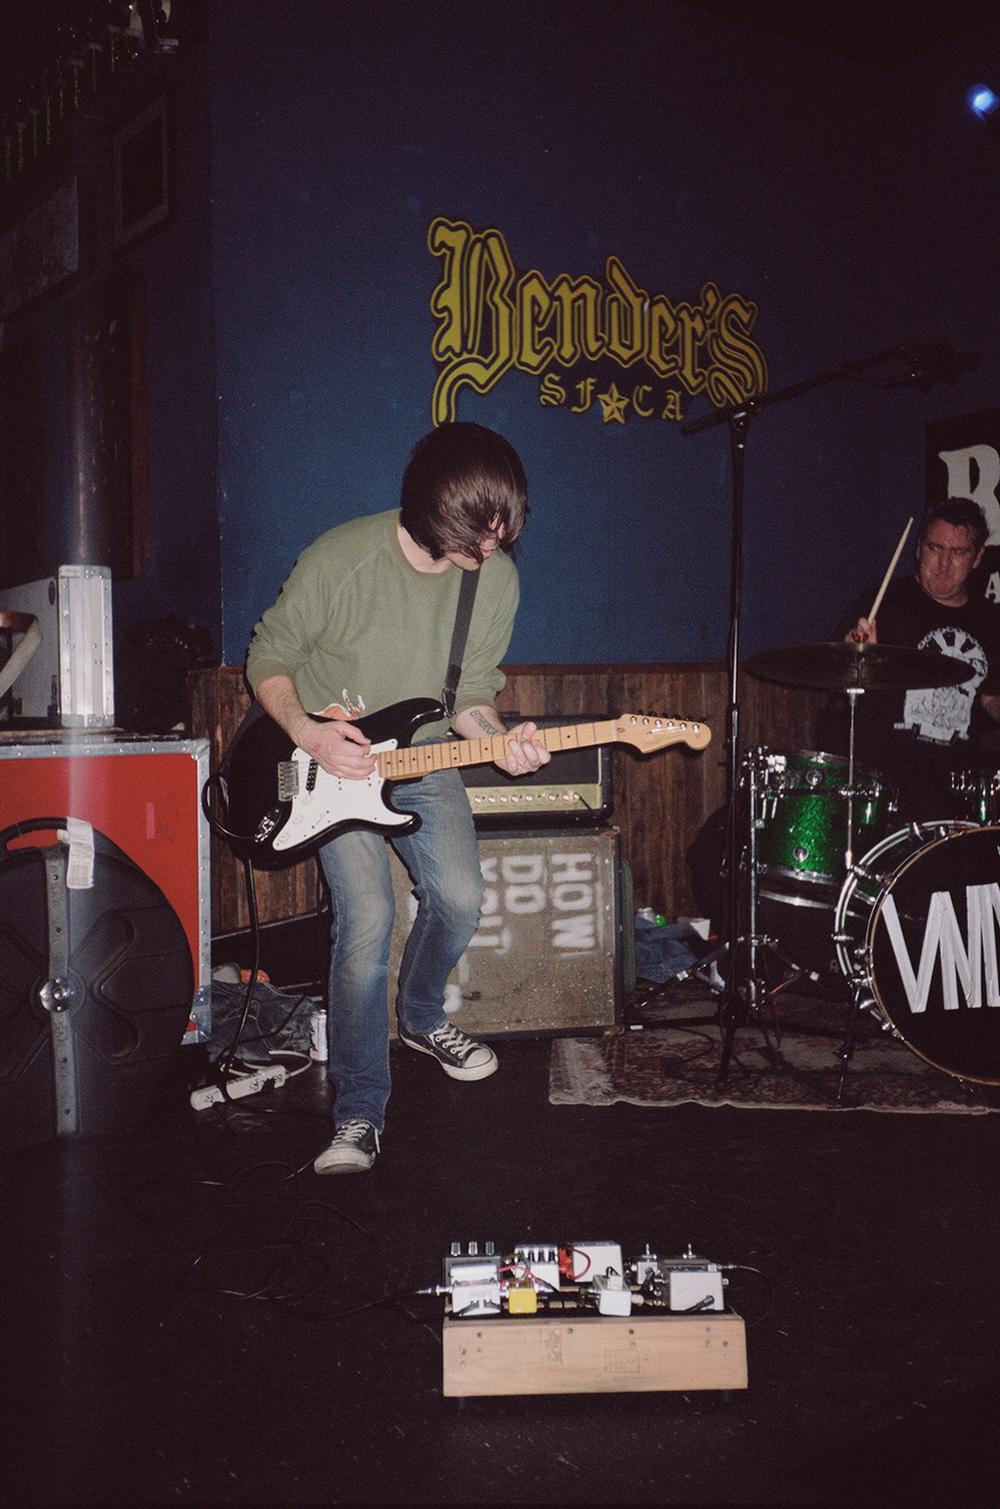 VNLVX: I Love This Tone